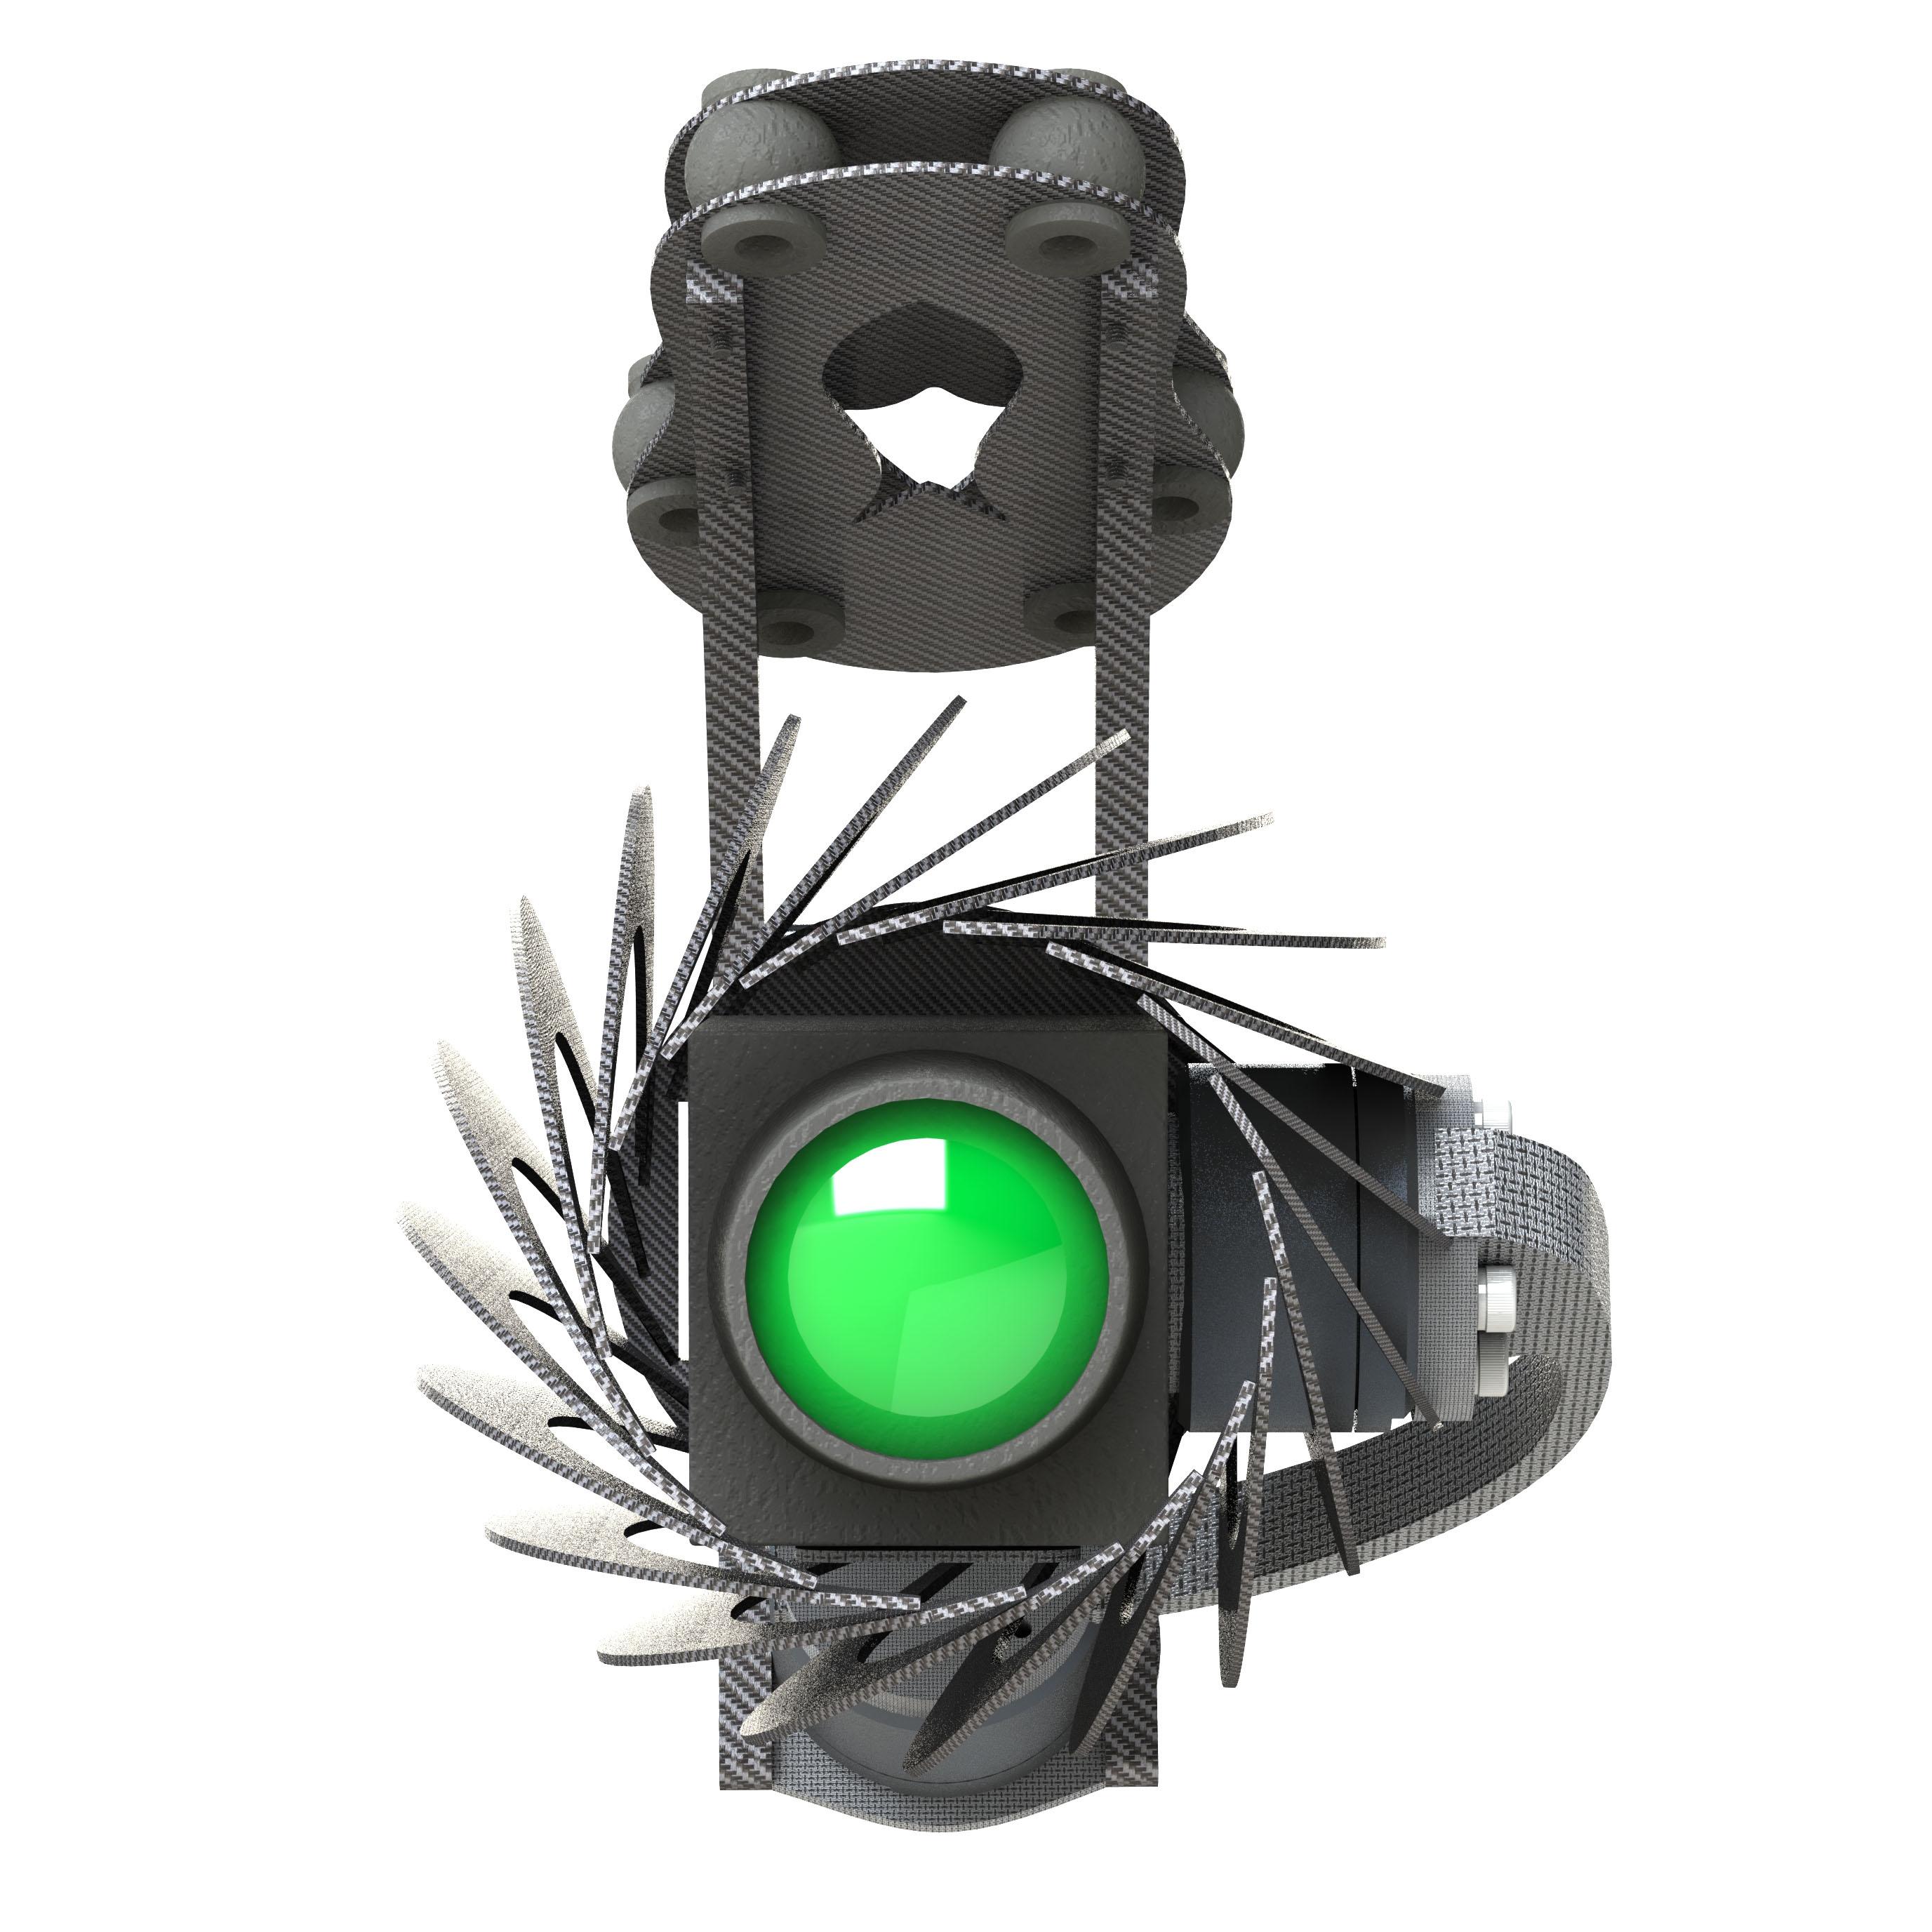 Gimbal for FLIR A65 thermal imaging Cameras